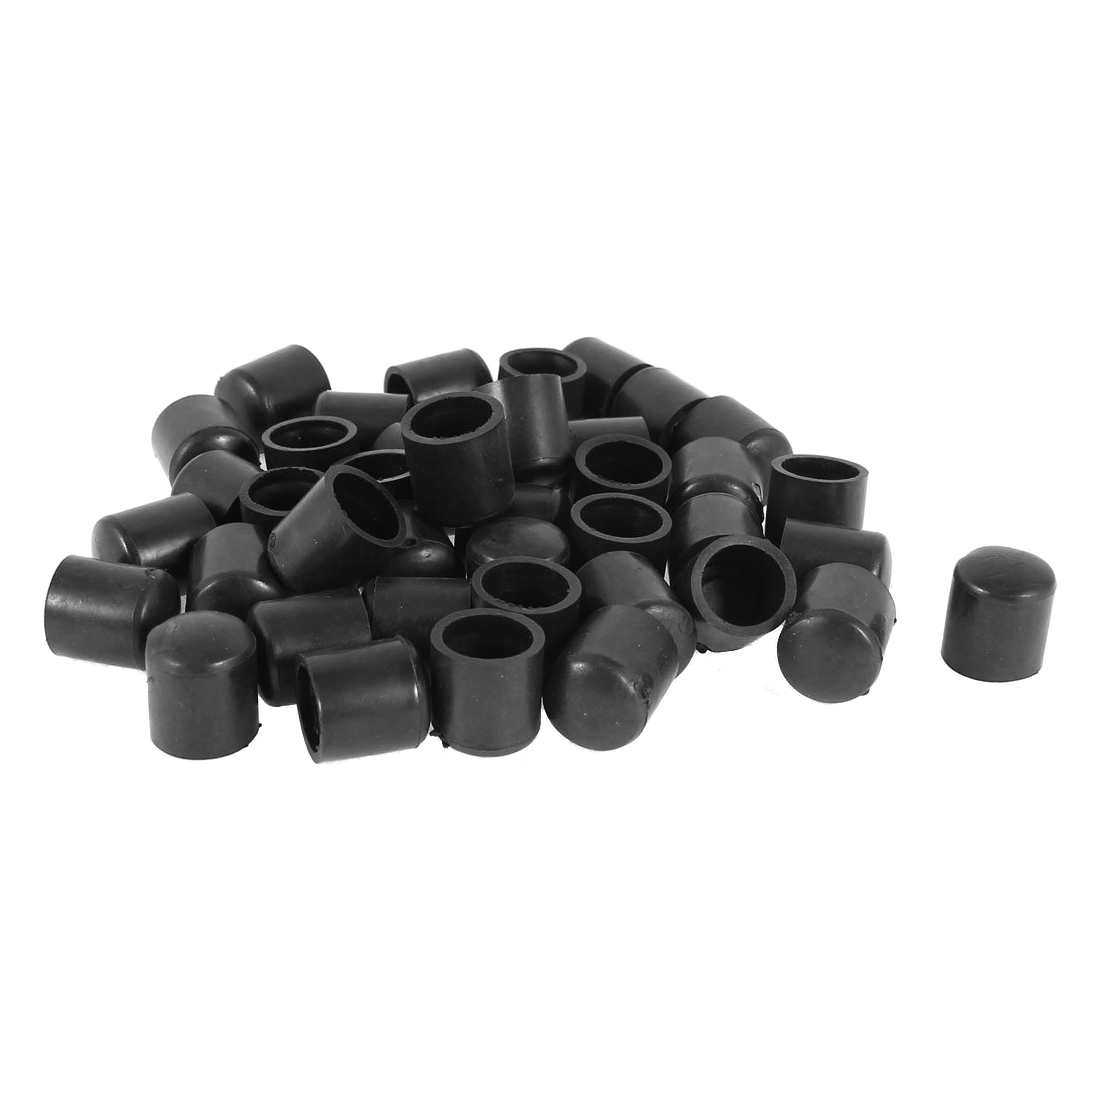 Contemplative Rubber Caps 40-piece Black Rubber Tube Ends 10mm Round